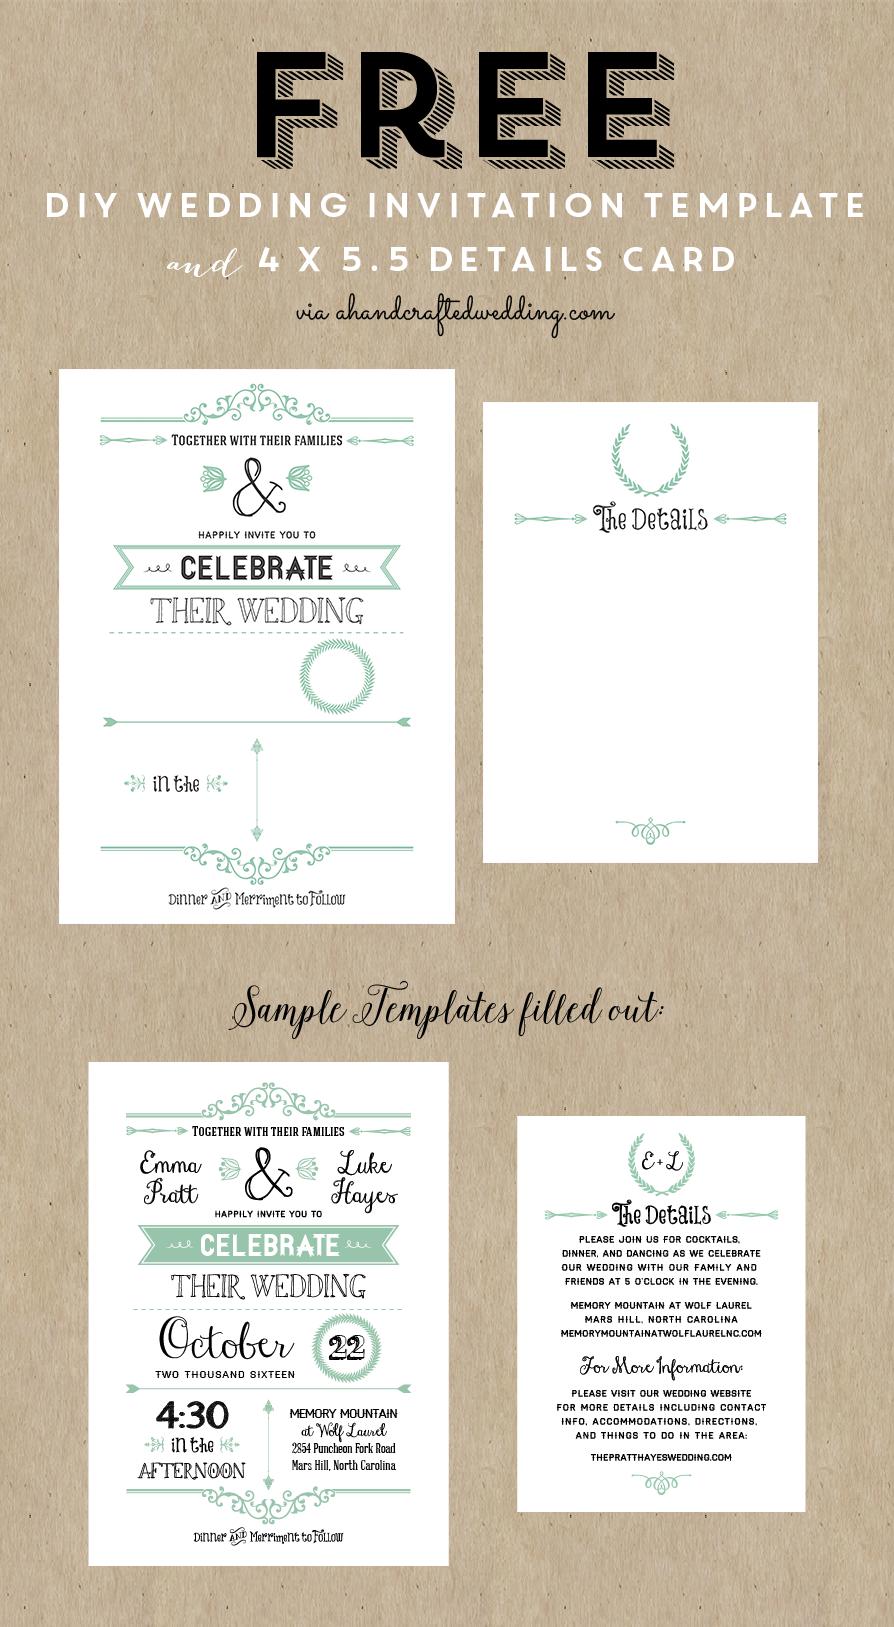 Free Printable Wedding Invitation Template | Wedding | Free Wedding - Free Printable Monogram Wedding Invitation Templates